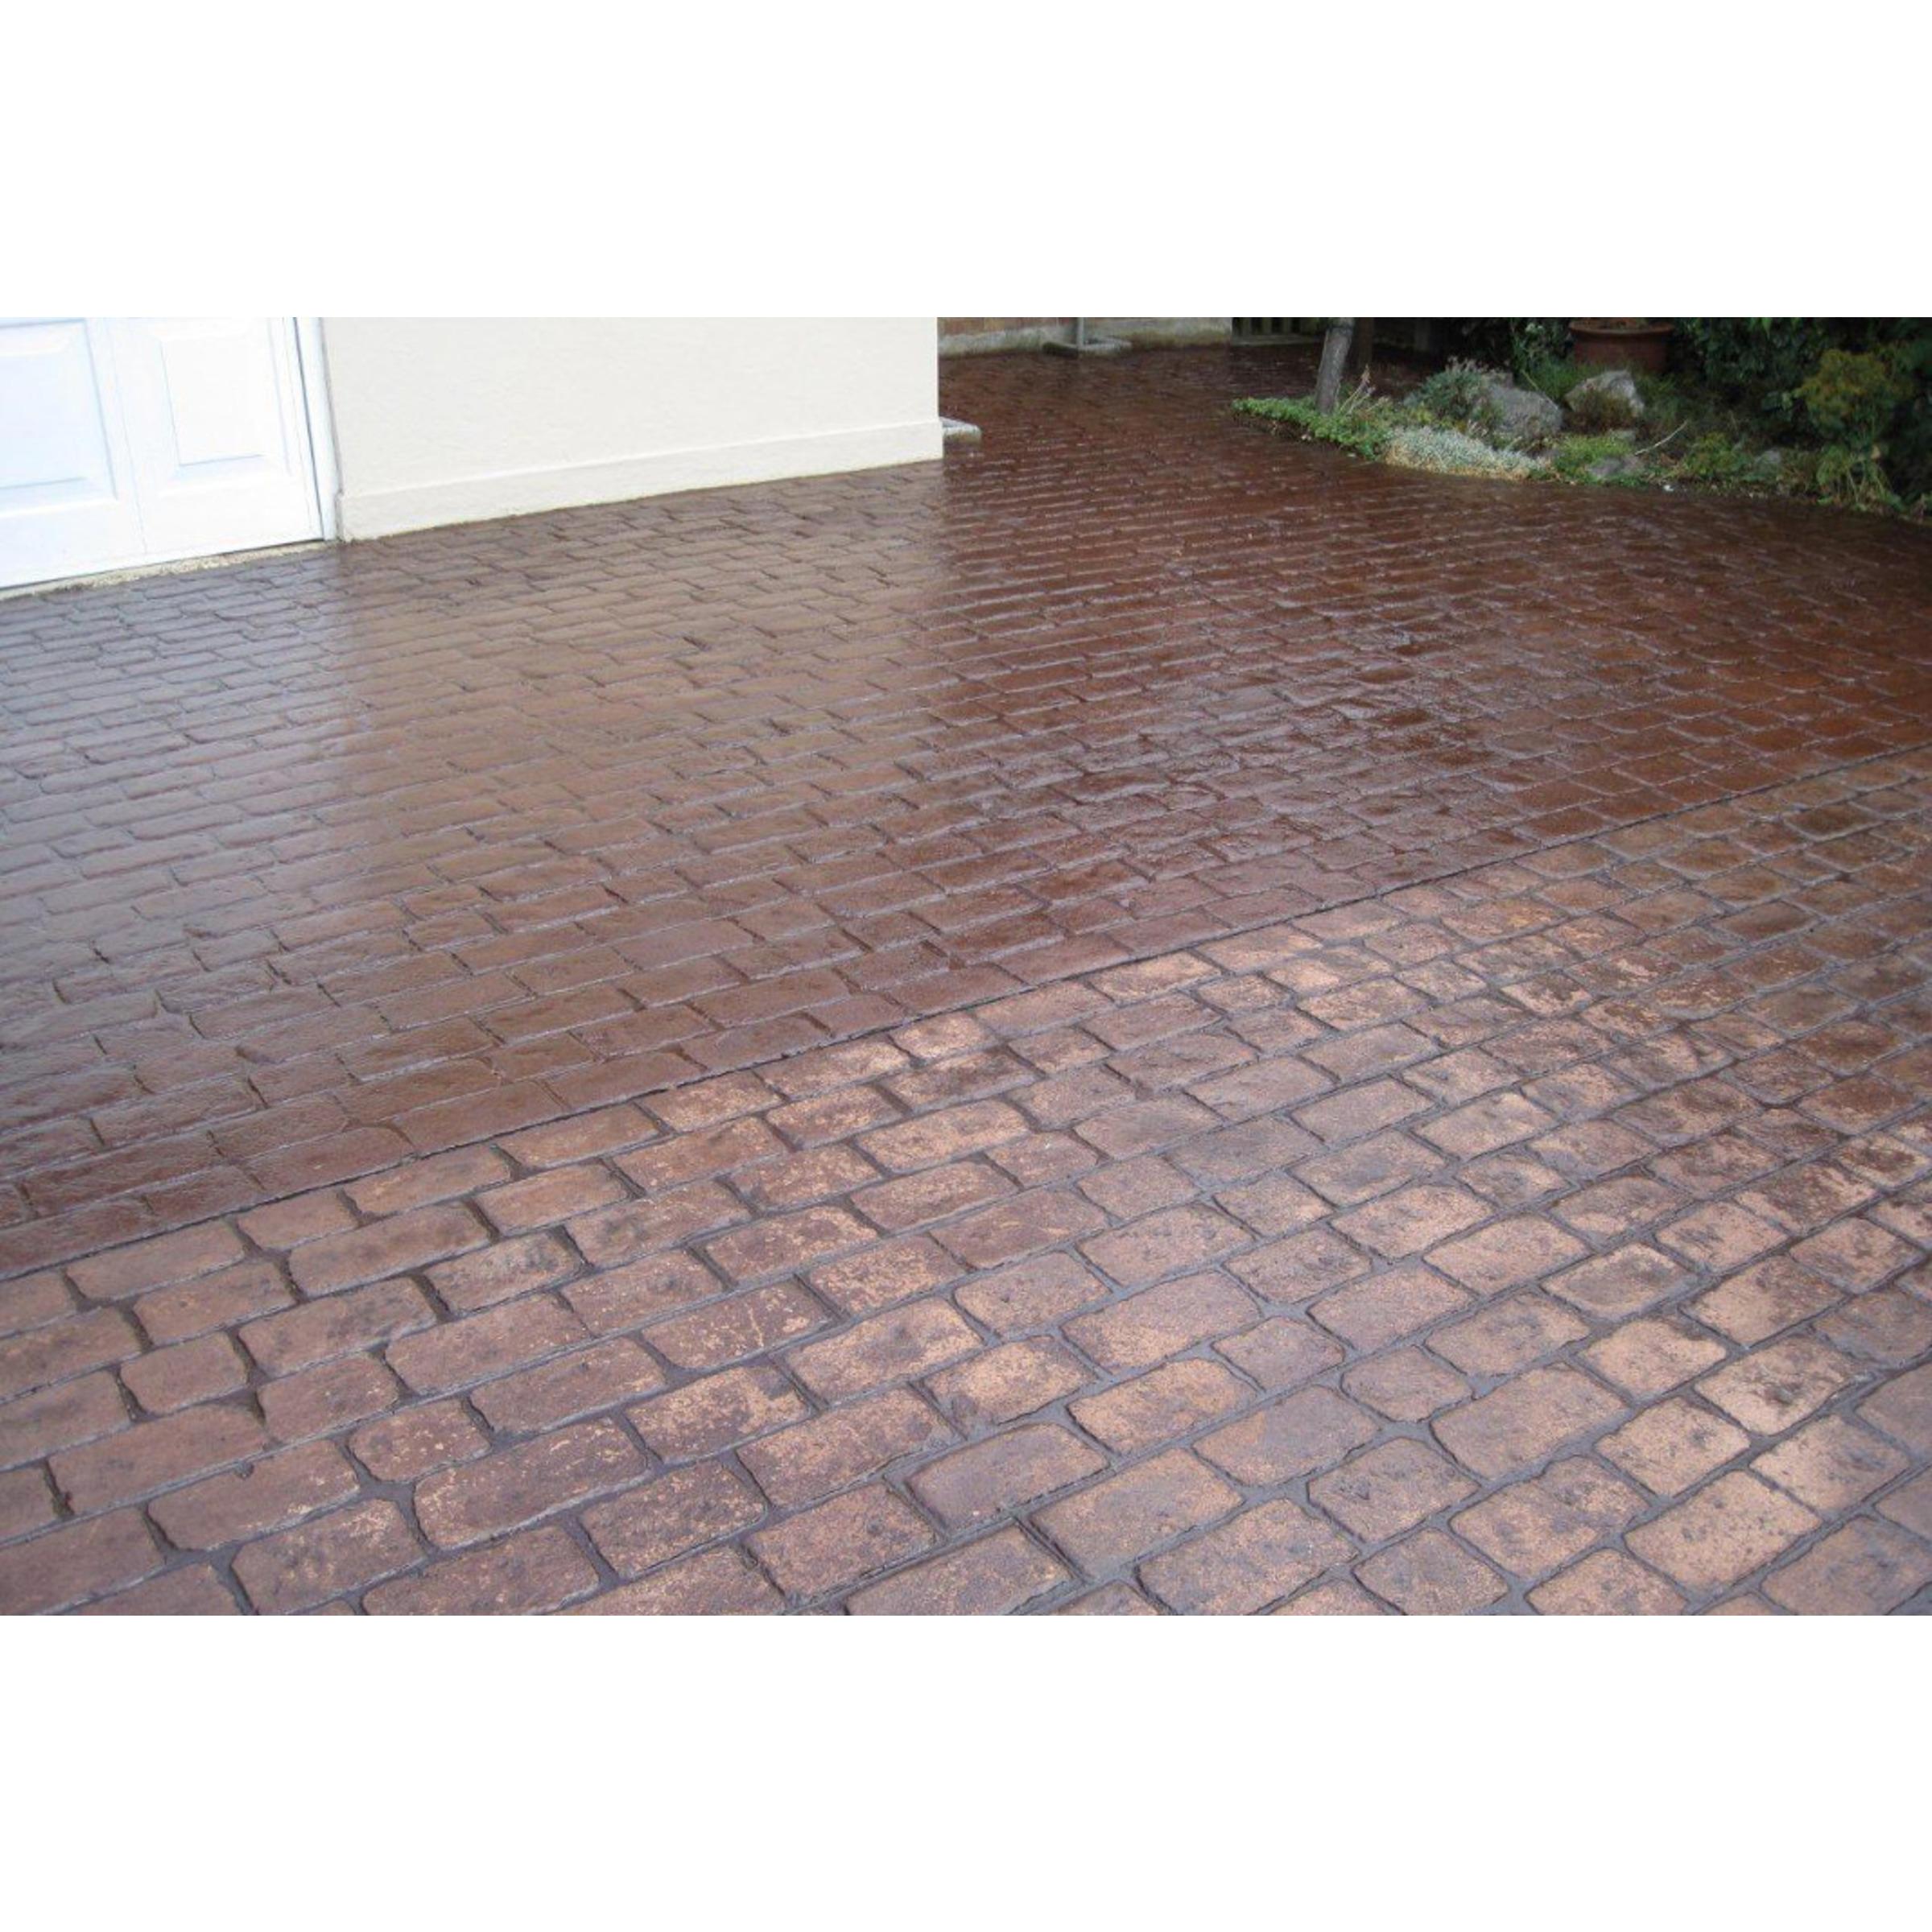 Satin Finish Cement : Wet look imprinted concrete sealer